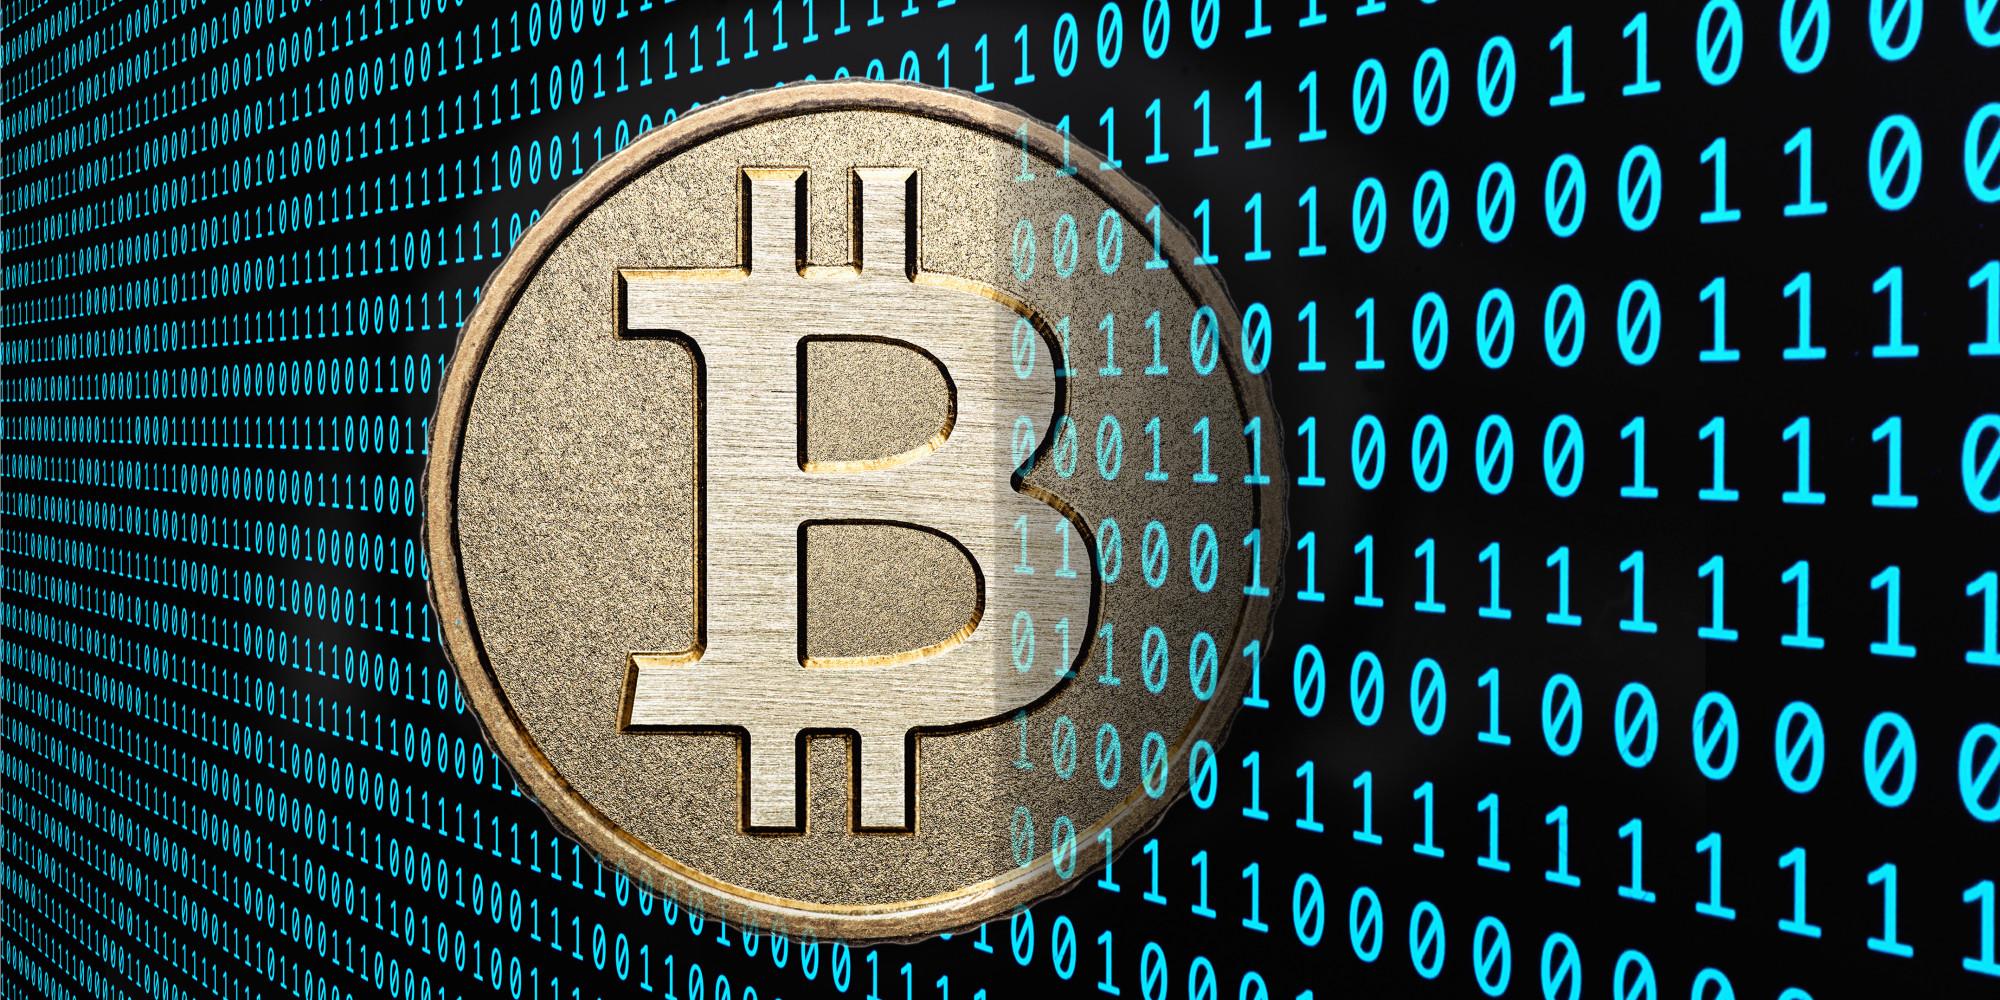 Exchange Bitcoin to Australian Dollar - bitcoin to AUD calculator